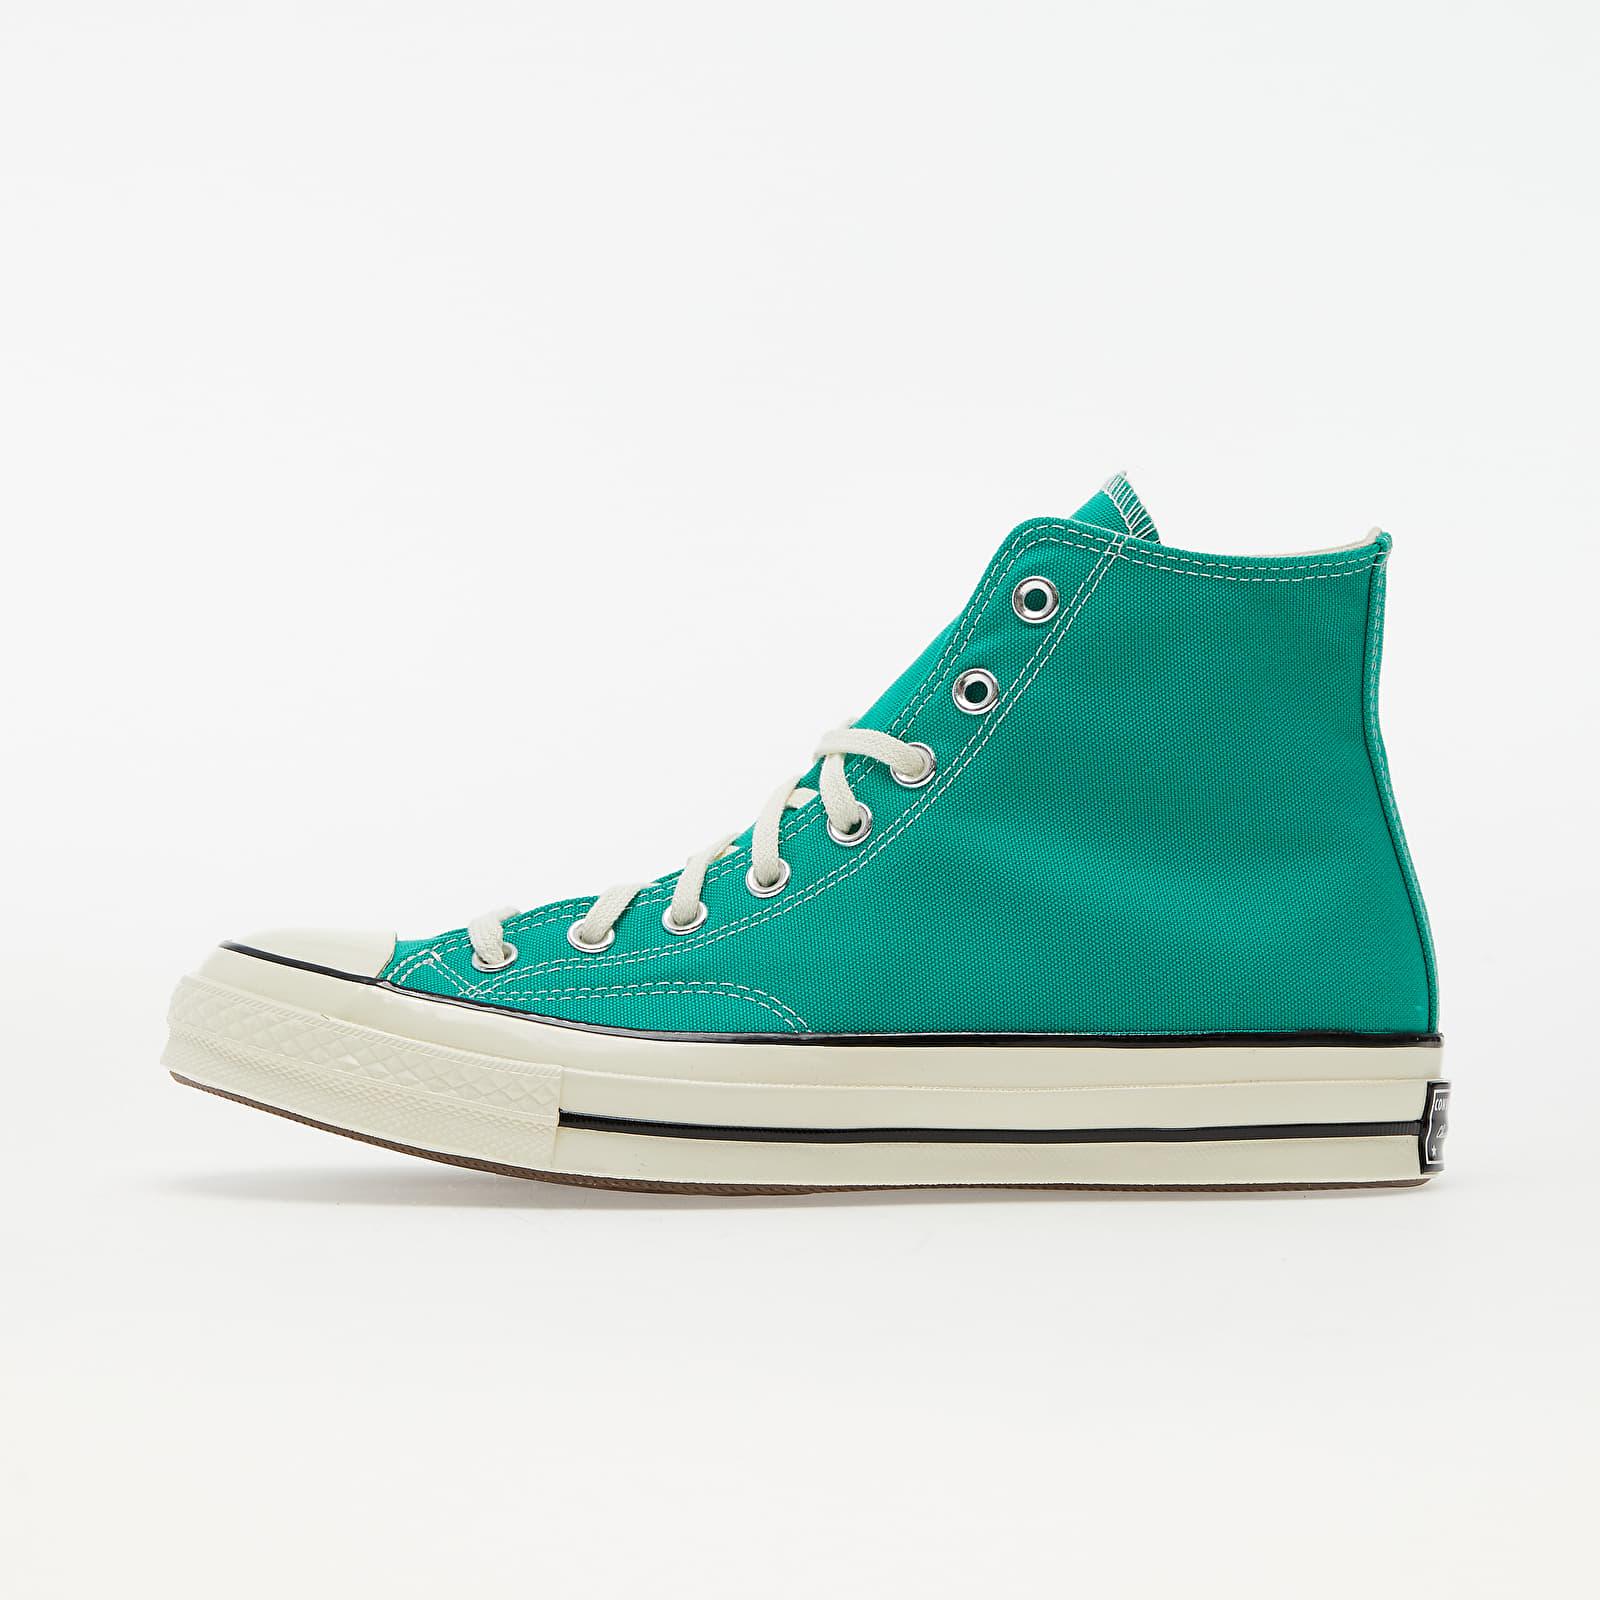 Converse Chuck 70 Court Green/ Egret/ Black 170089C